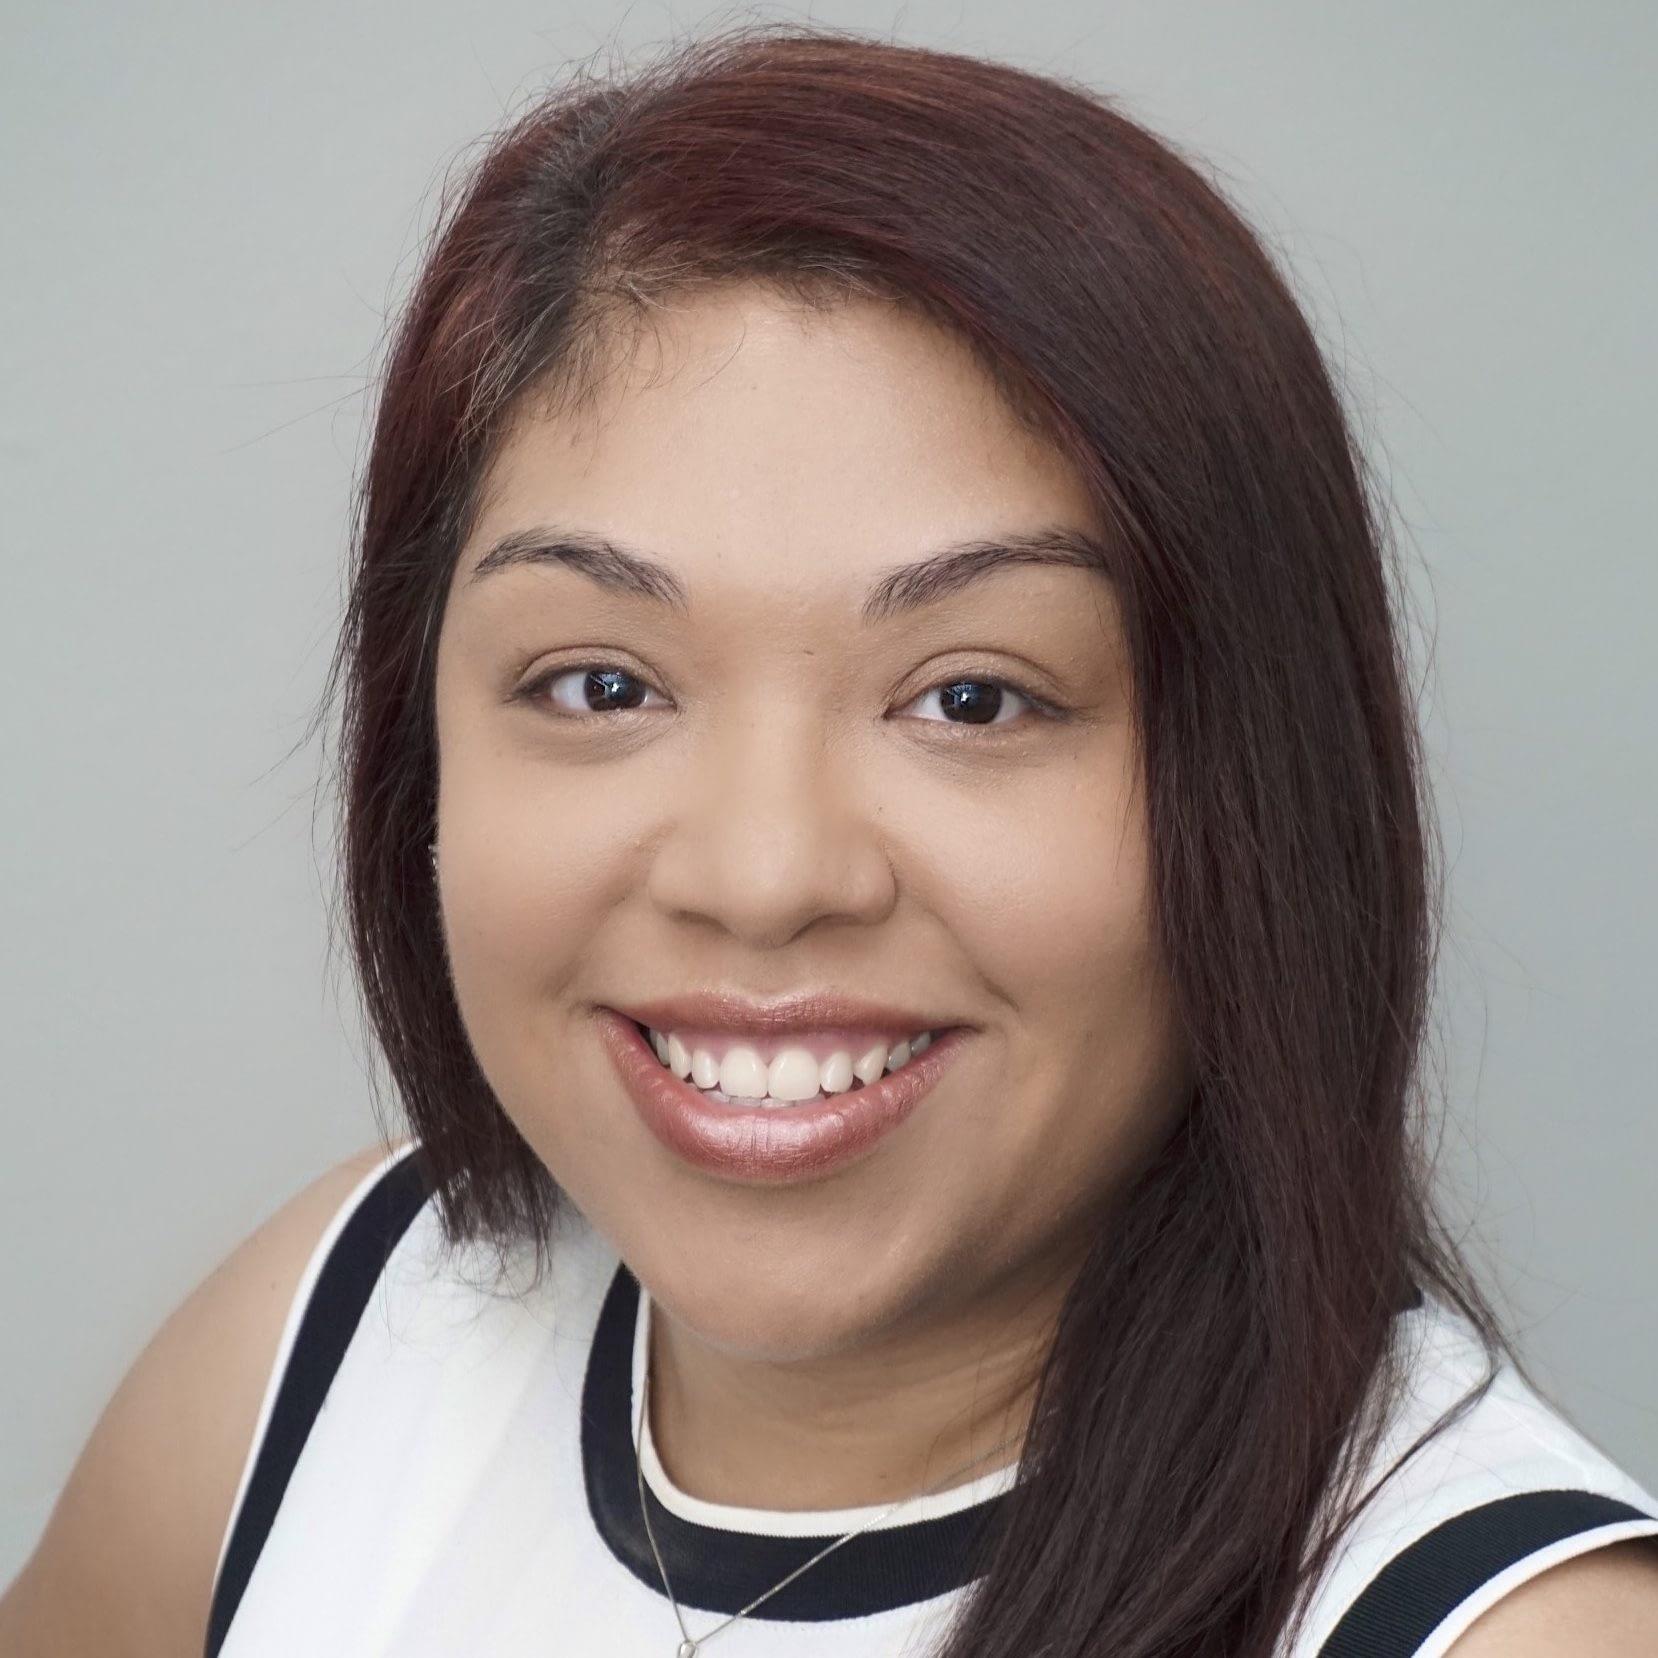 Ericka Villanueva